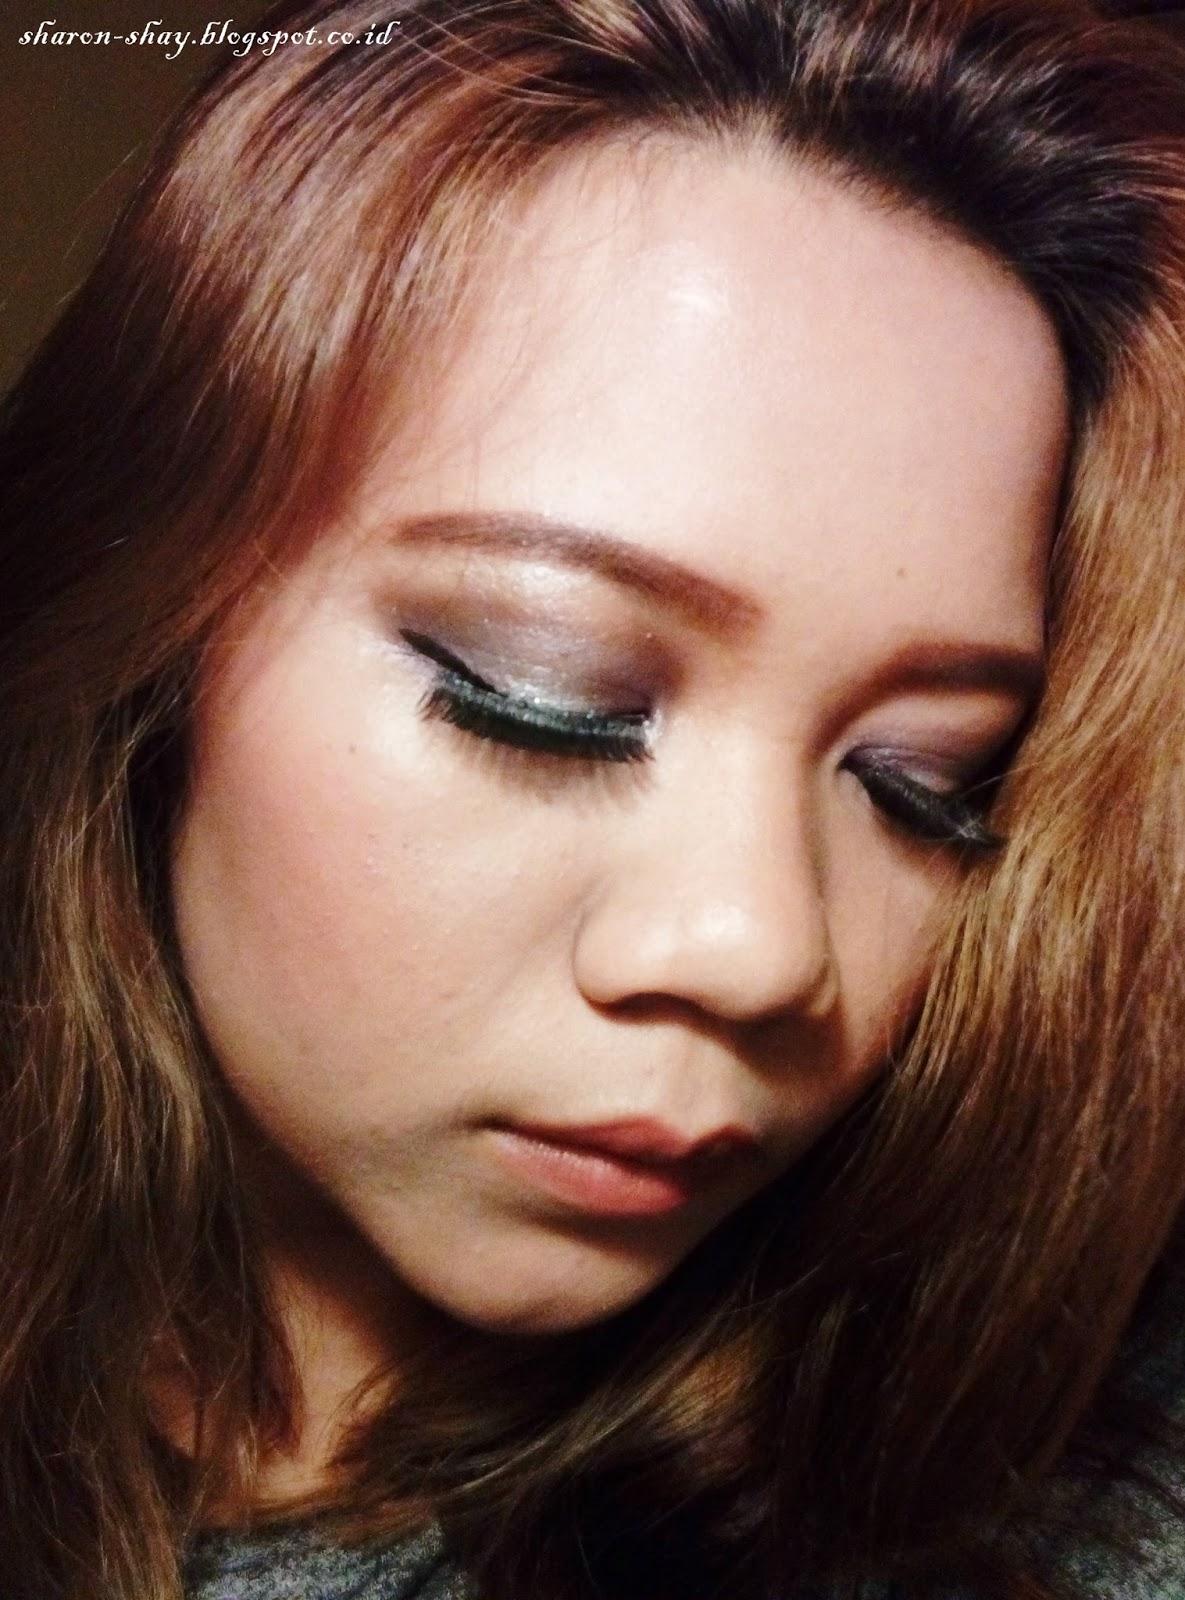 Sharon Shay FOTD No Pink For Dating Makeup Collaboration